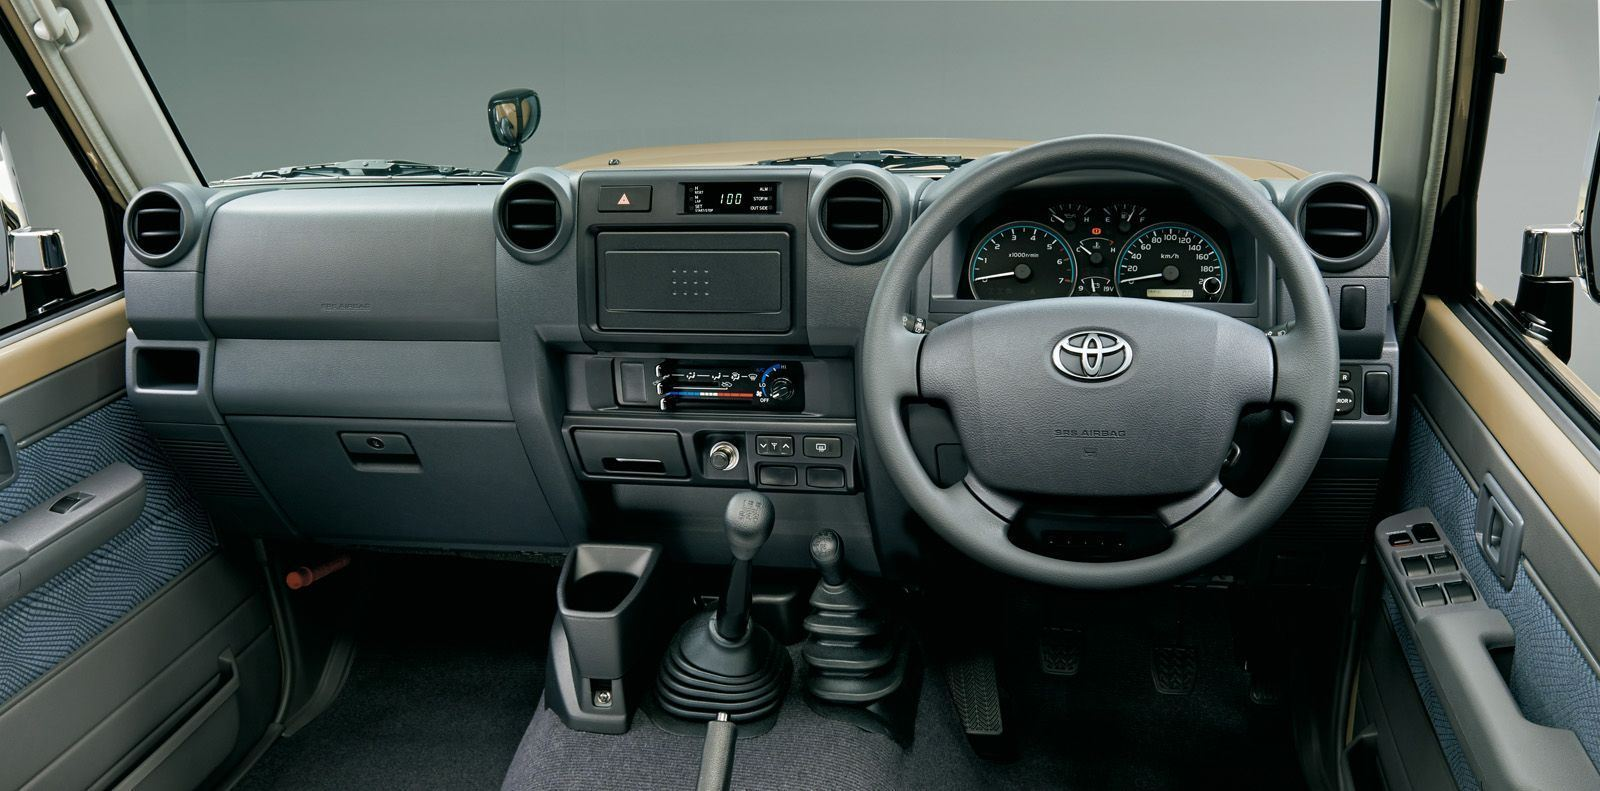 Toyota-Land-Cruiser-70-Series-1